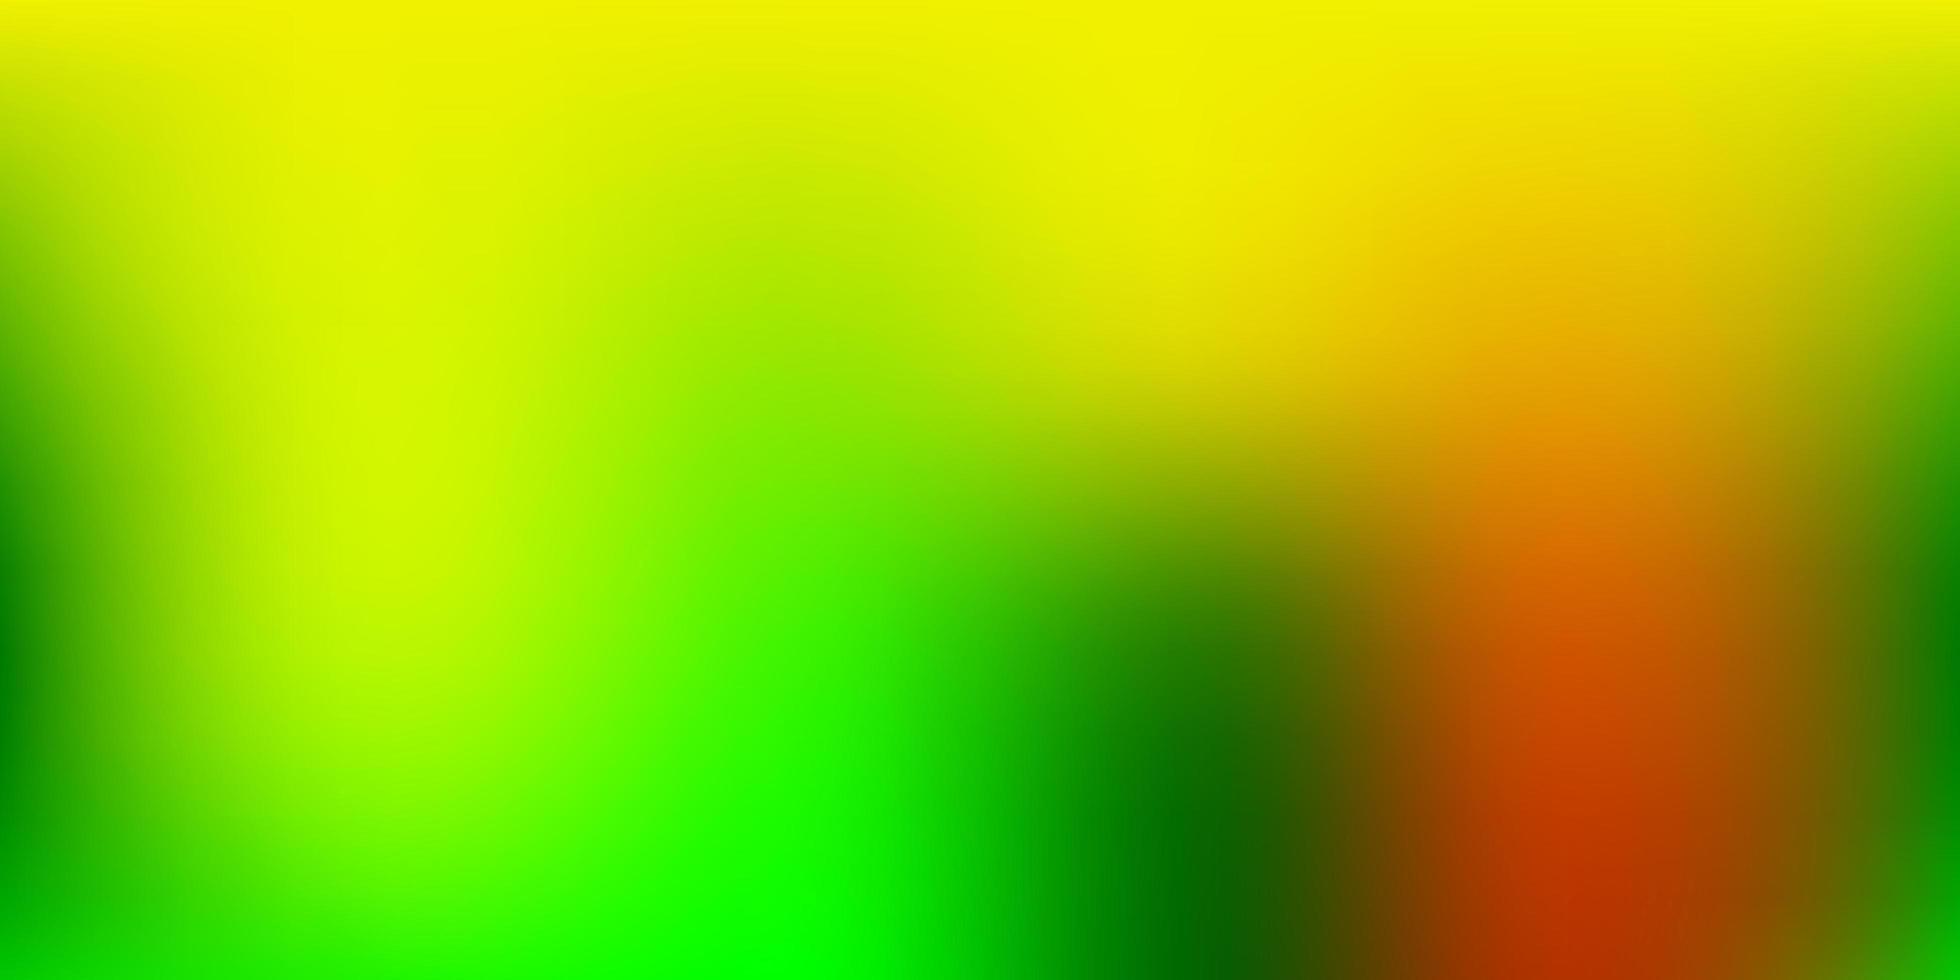 motif flou vert clair, jaune. vecteur